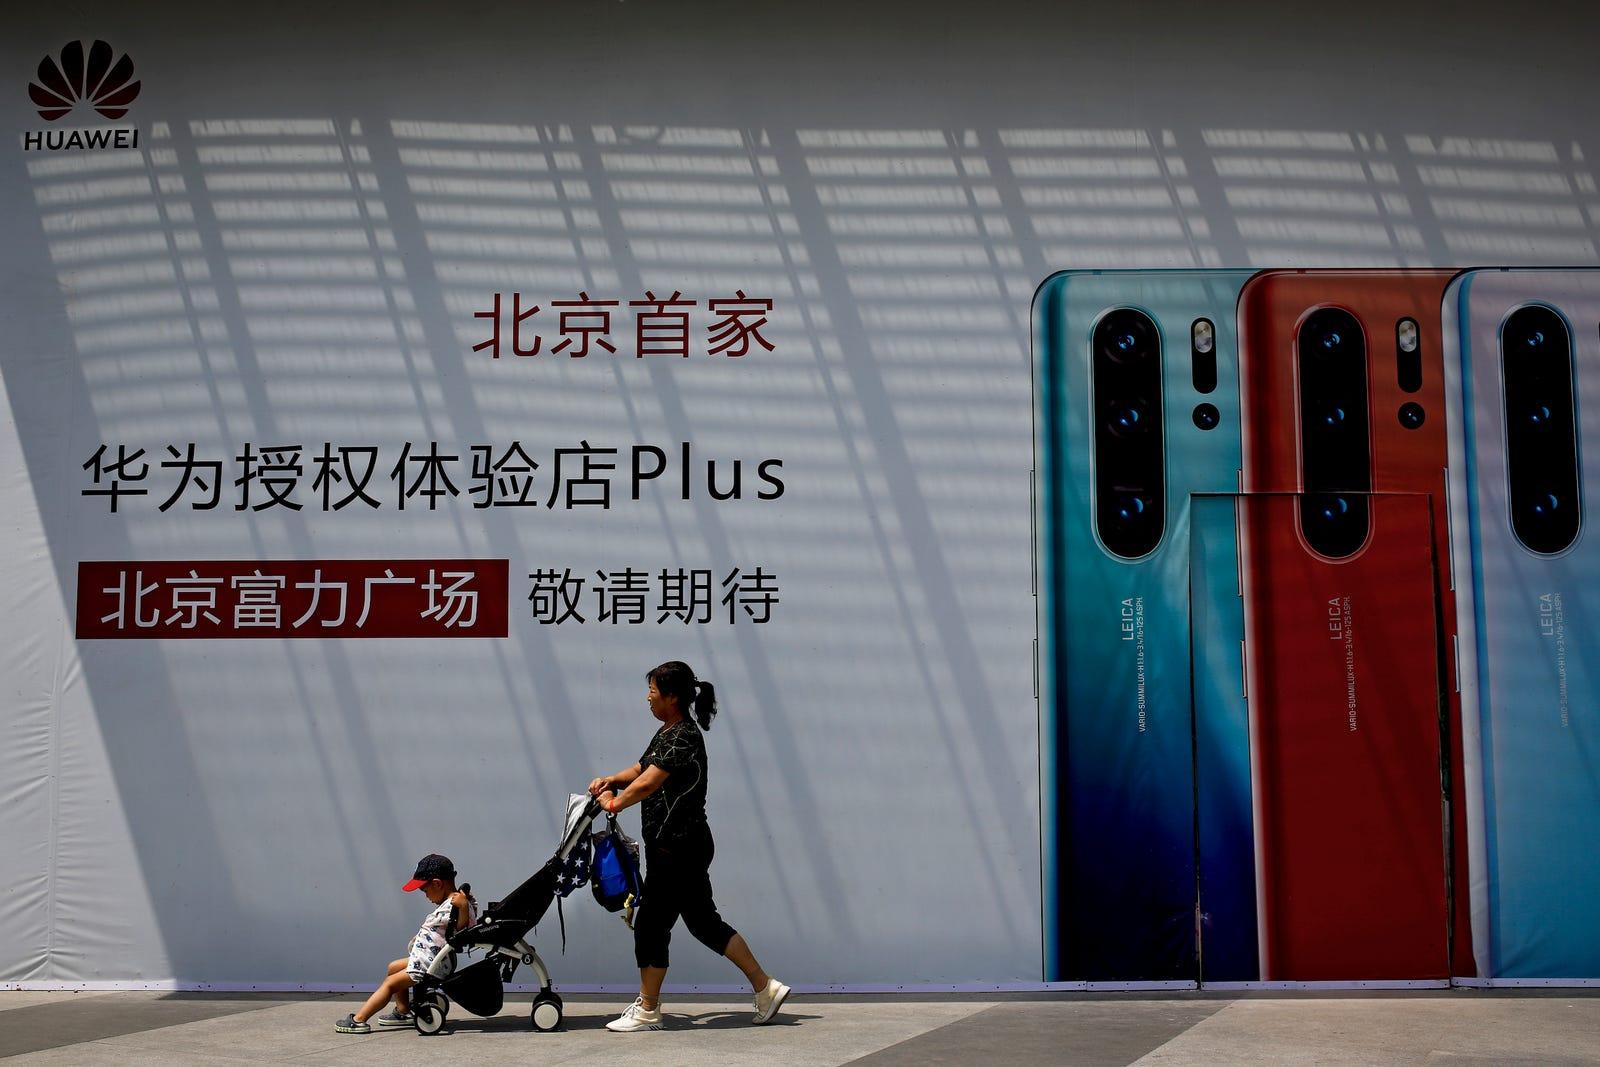 Vetar a Huawei es el segundo gran error de la historia de EEUU con China. El primero se llamó Qian Xuesen